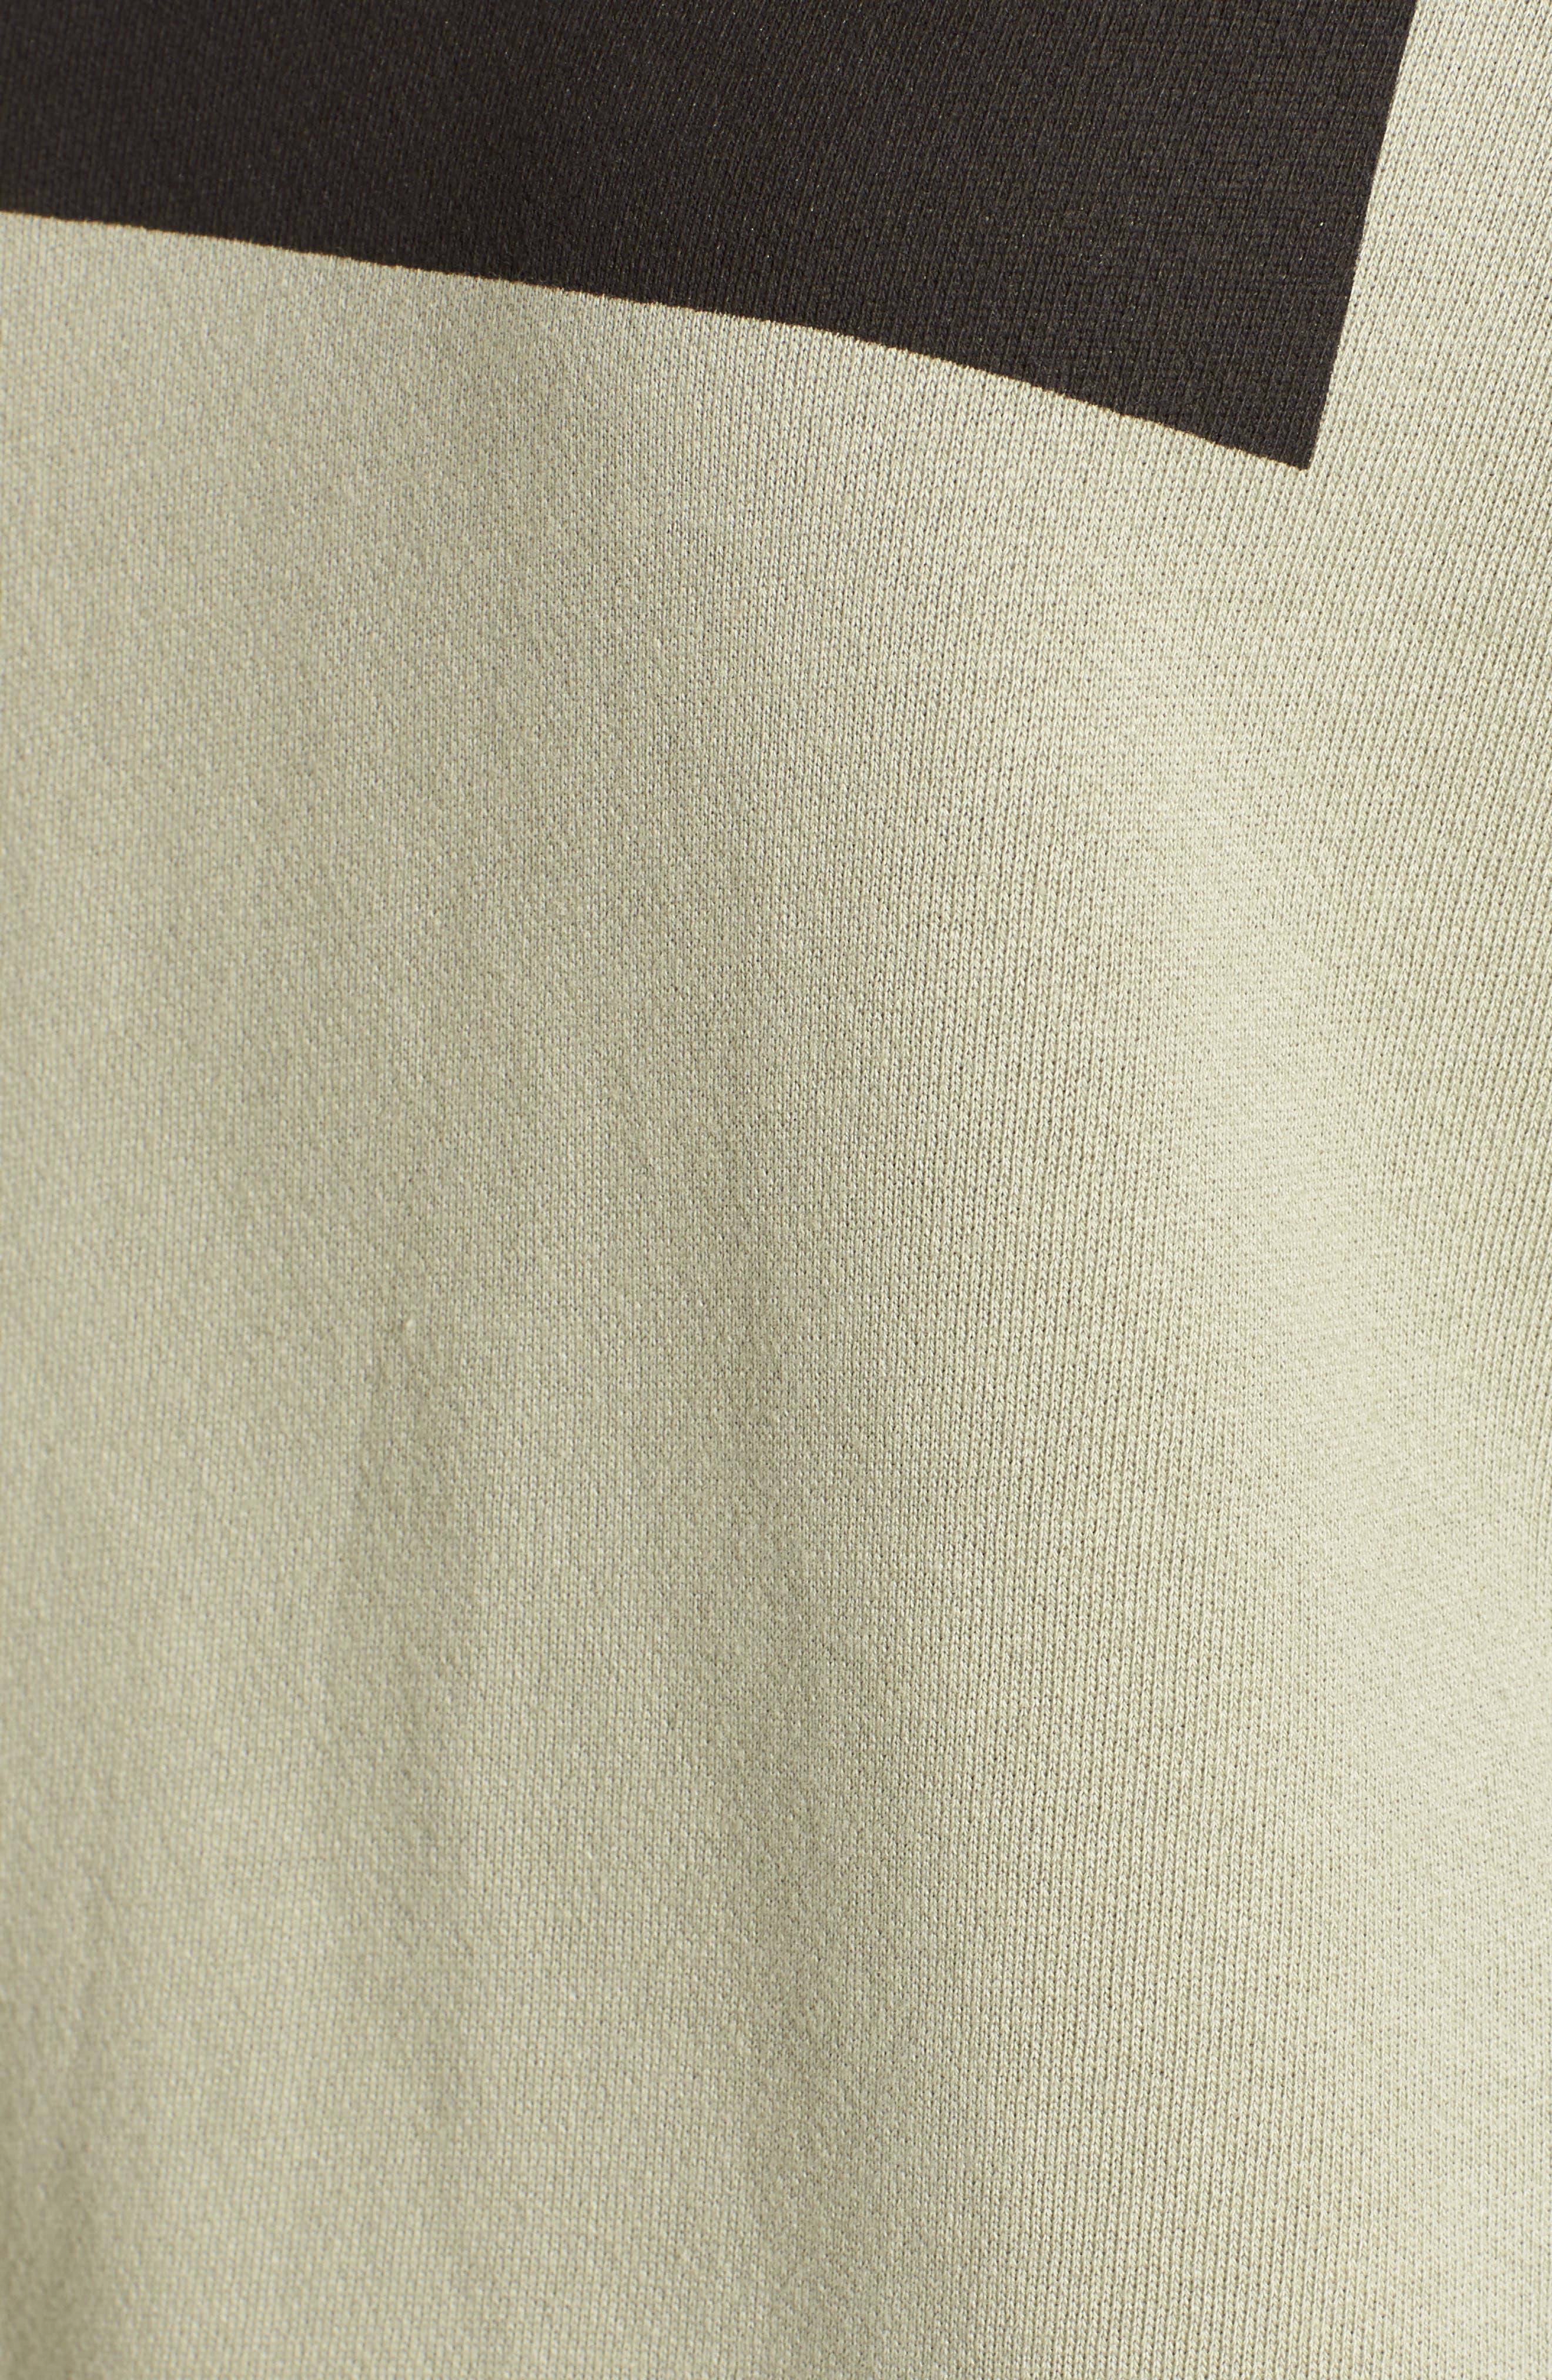 Army of Lovers Side Zip Sweatshirt,                             Alternate thumbnail 6, color,                             301